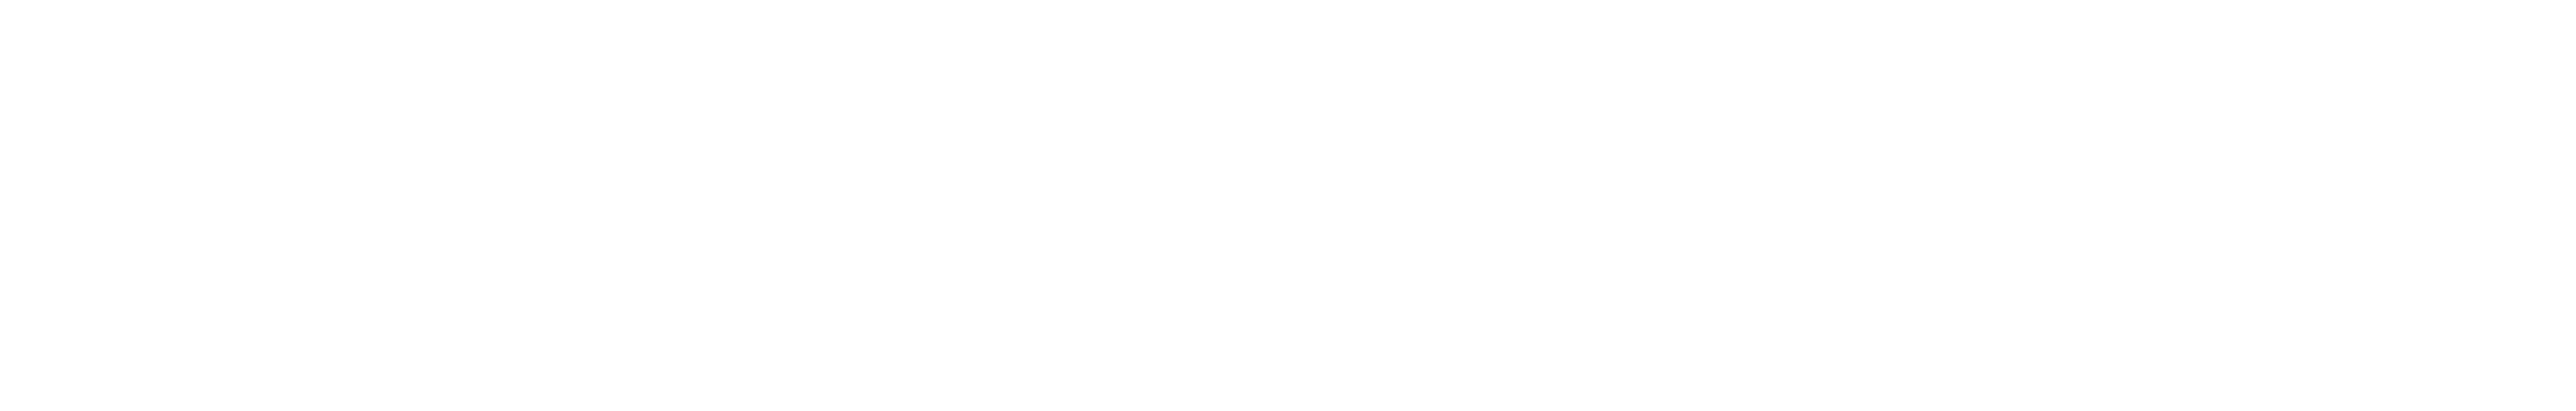 VT-Logo-Bianco-02